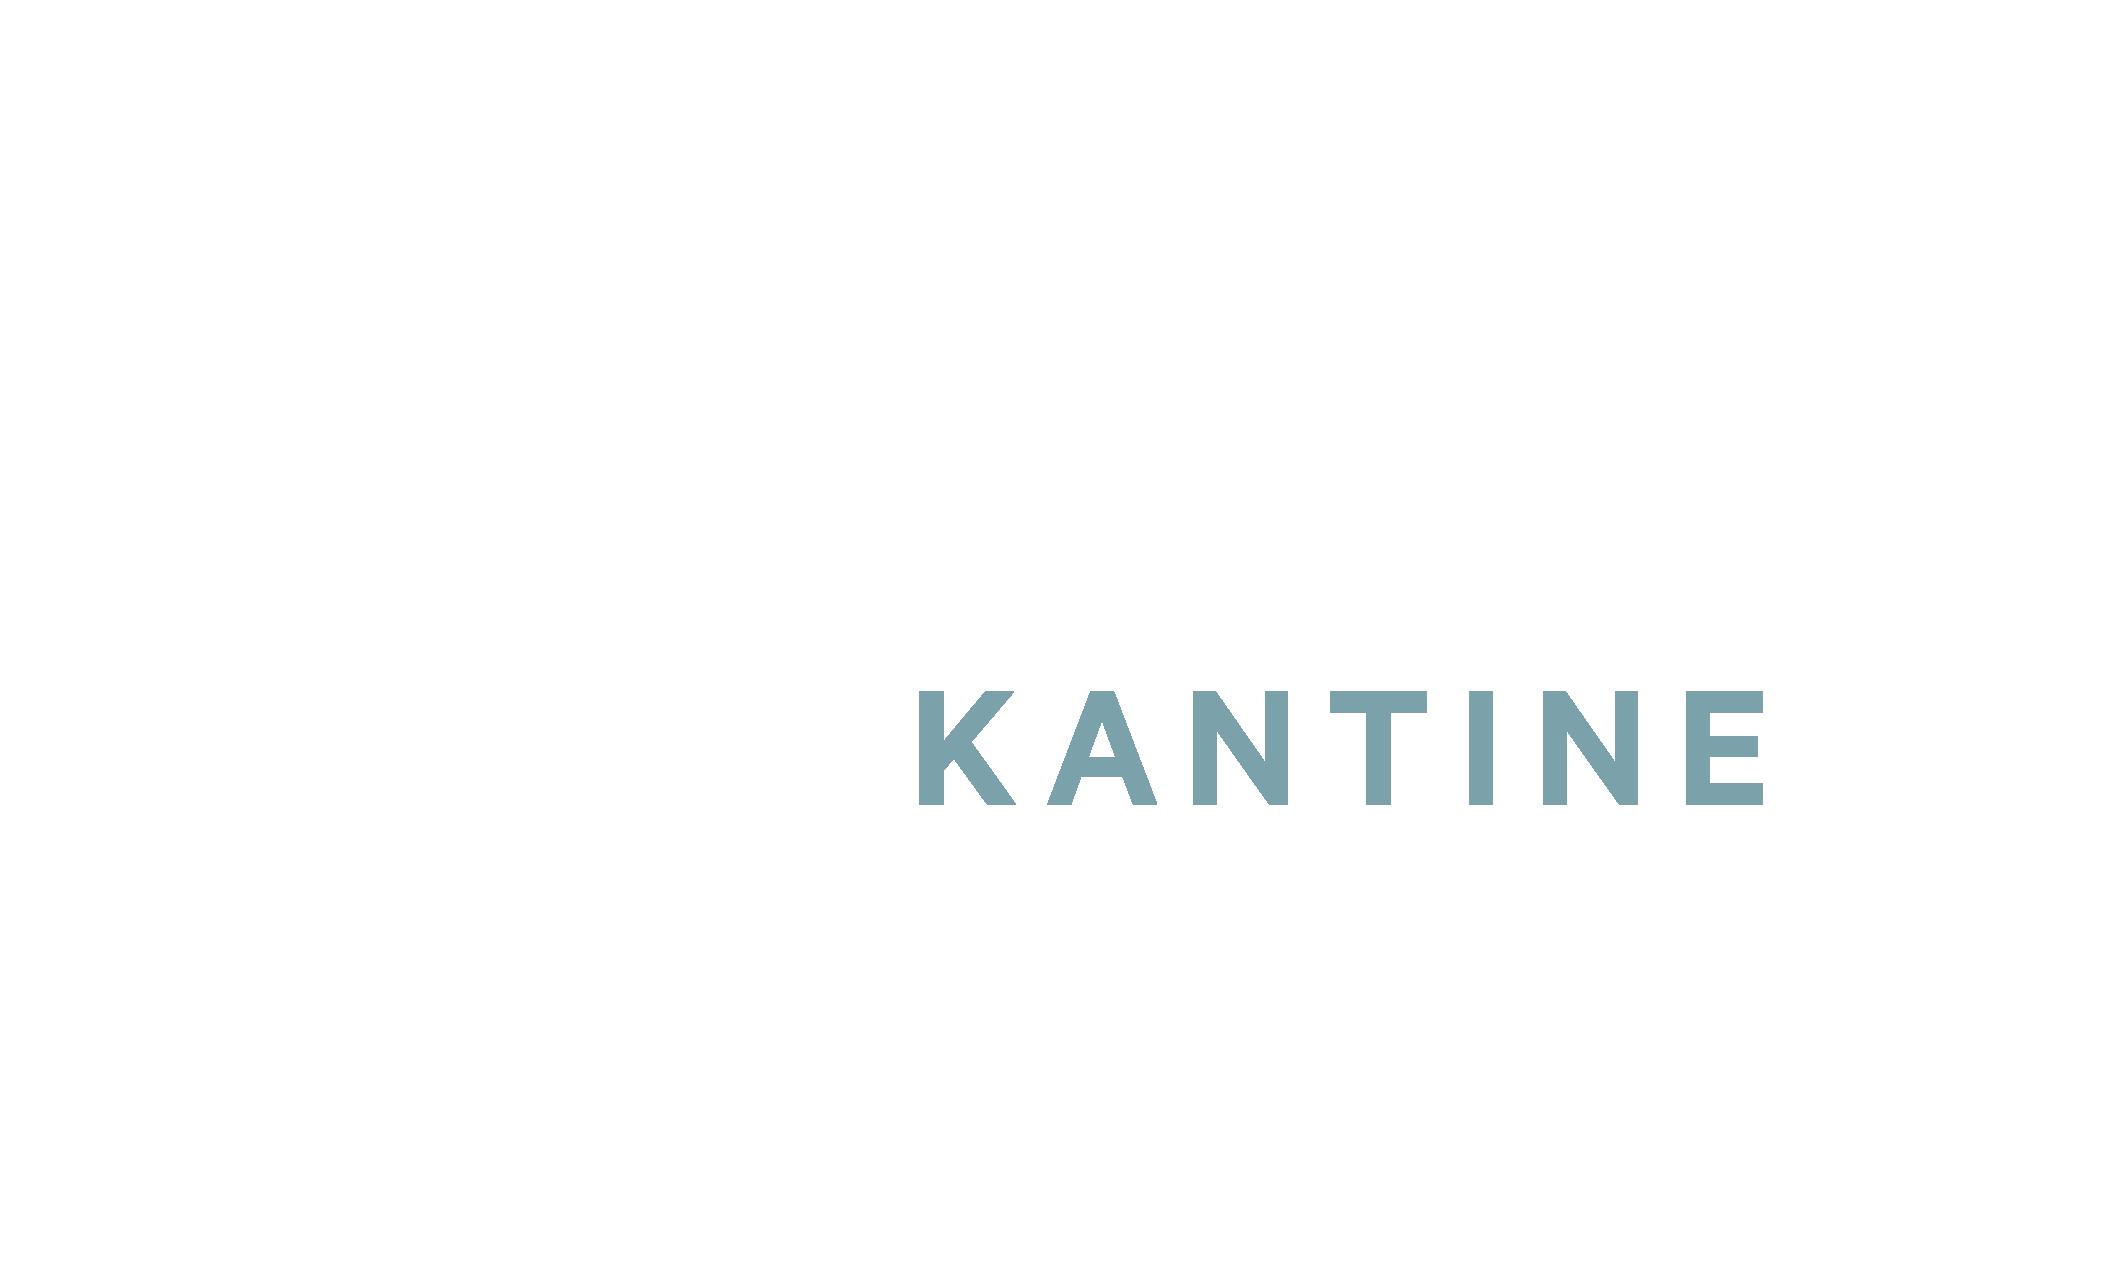 fg_kantine_horisontal_rgb_negativ